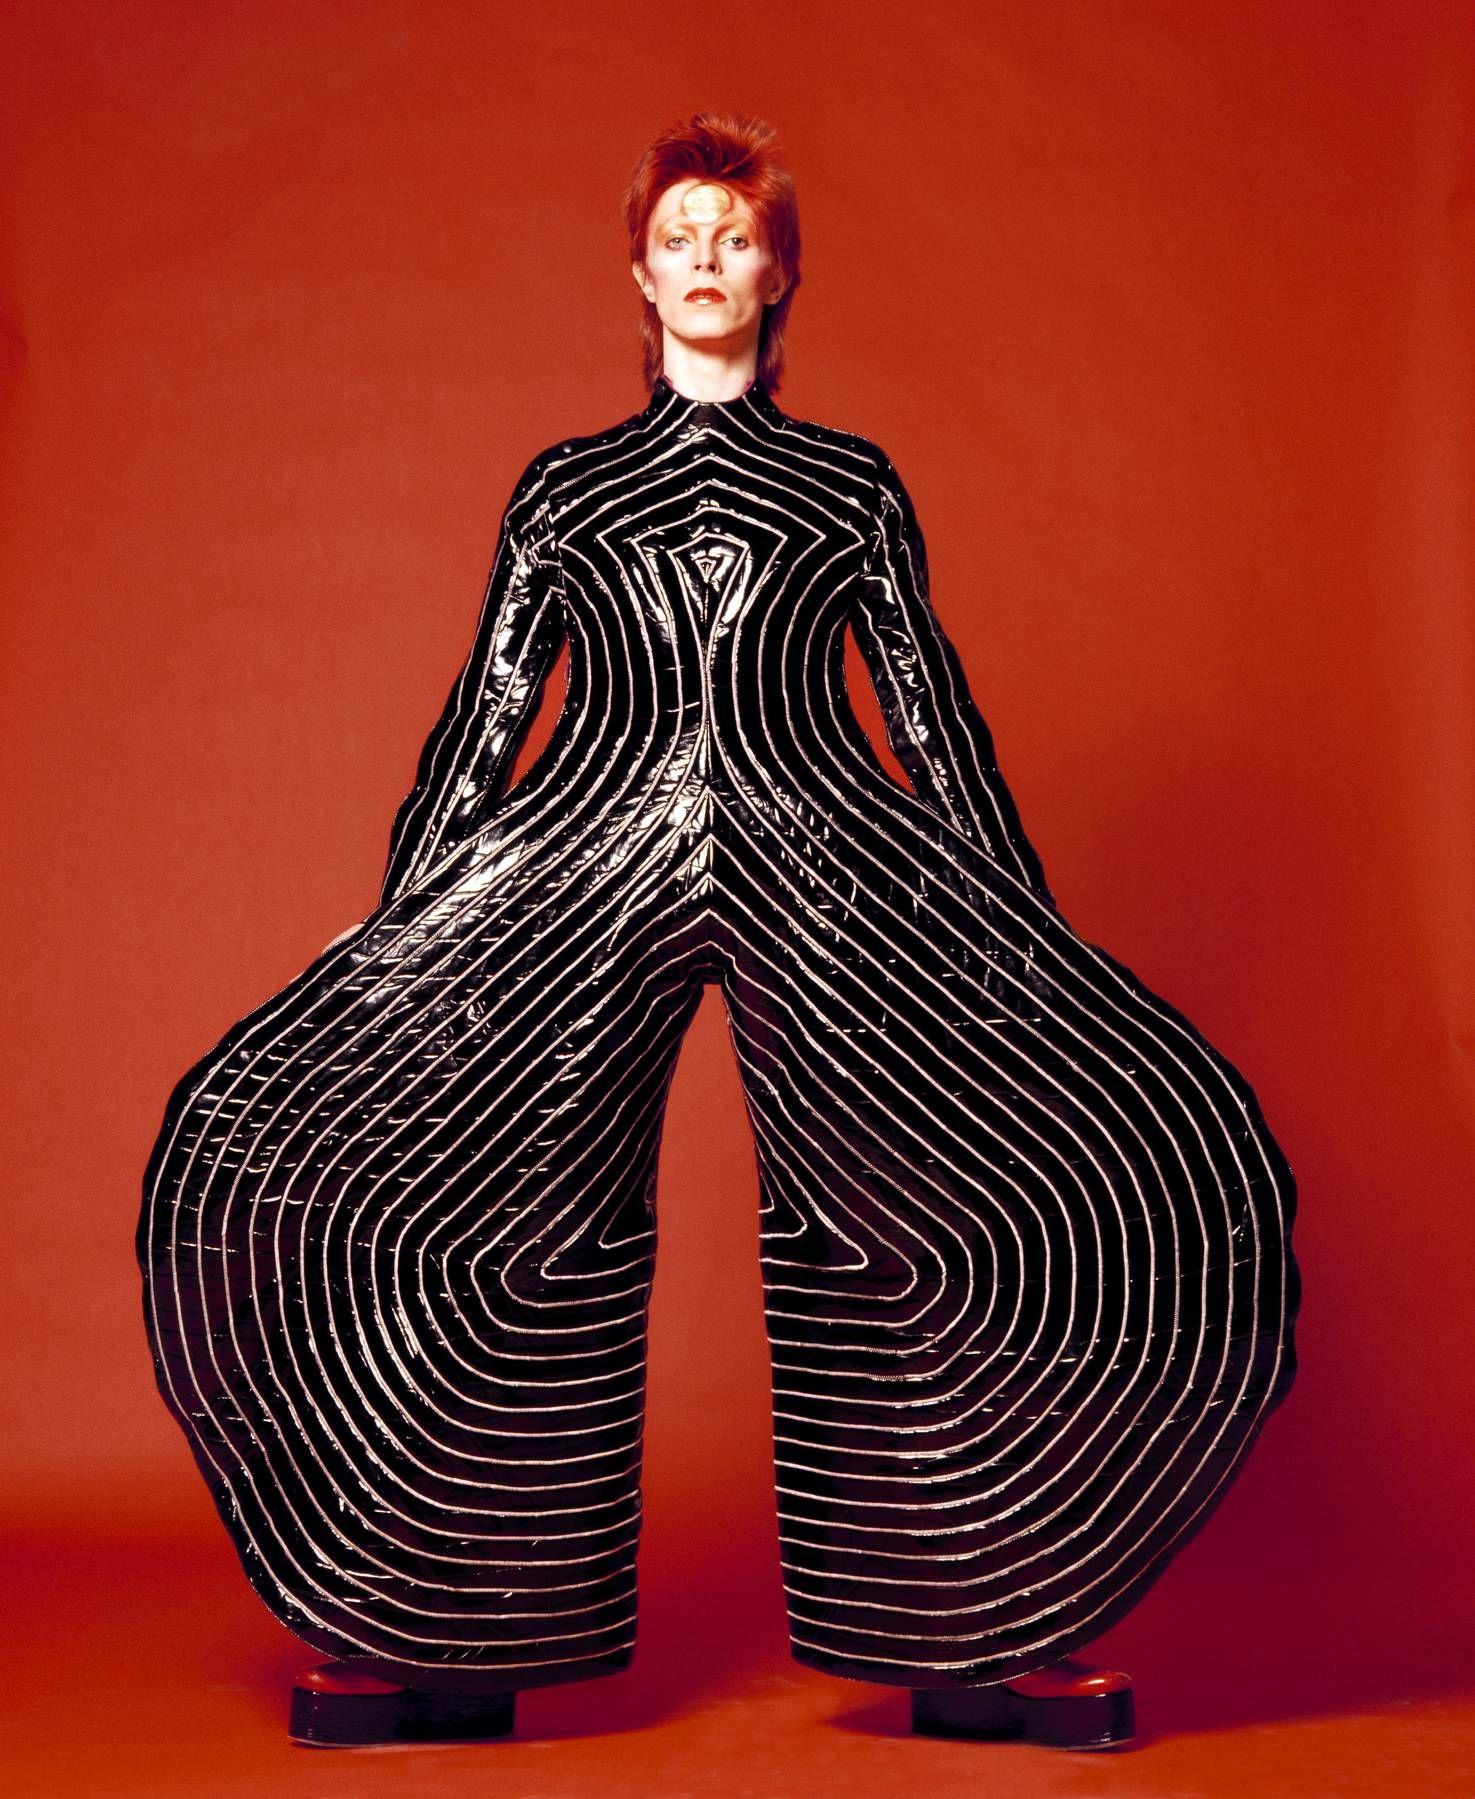 Striped bodysuit for Aladdin Sane tour, 1973 Design by Kansai Yamamoto Photograph by Masayoshi Sukita. The David Bowie Archive 2012